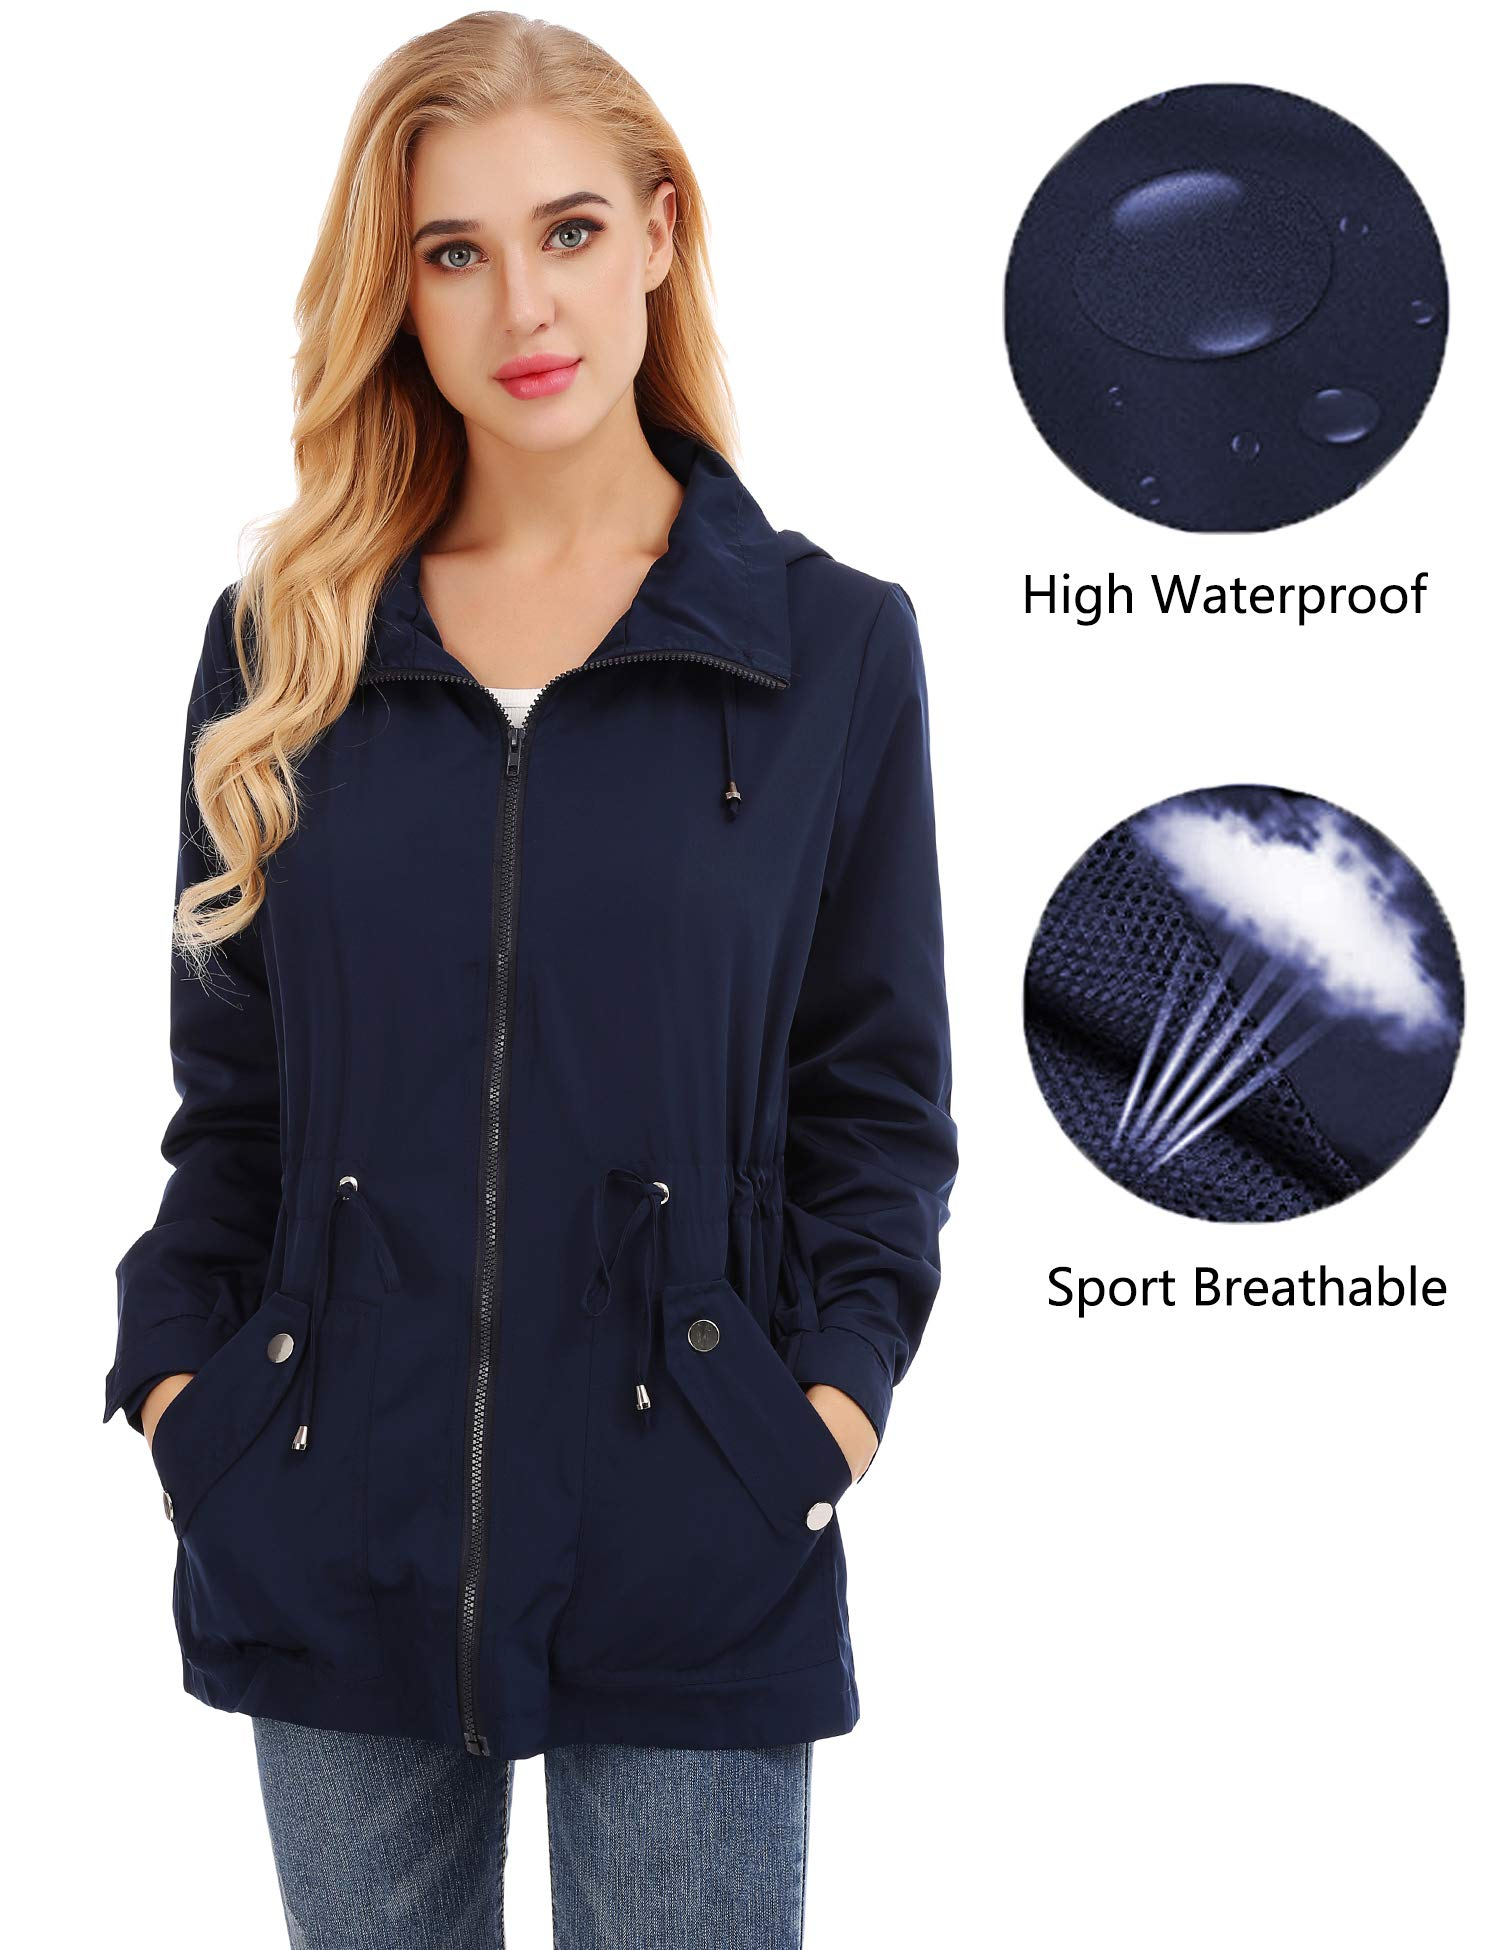 FISOUL Raincoats Women's Waterproof Lightweight Rain Jacket Outdoor Hooded Trench Navy Blue XL